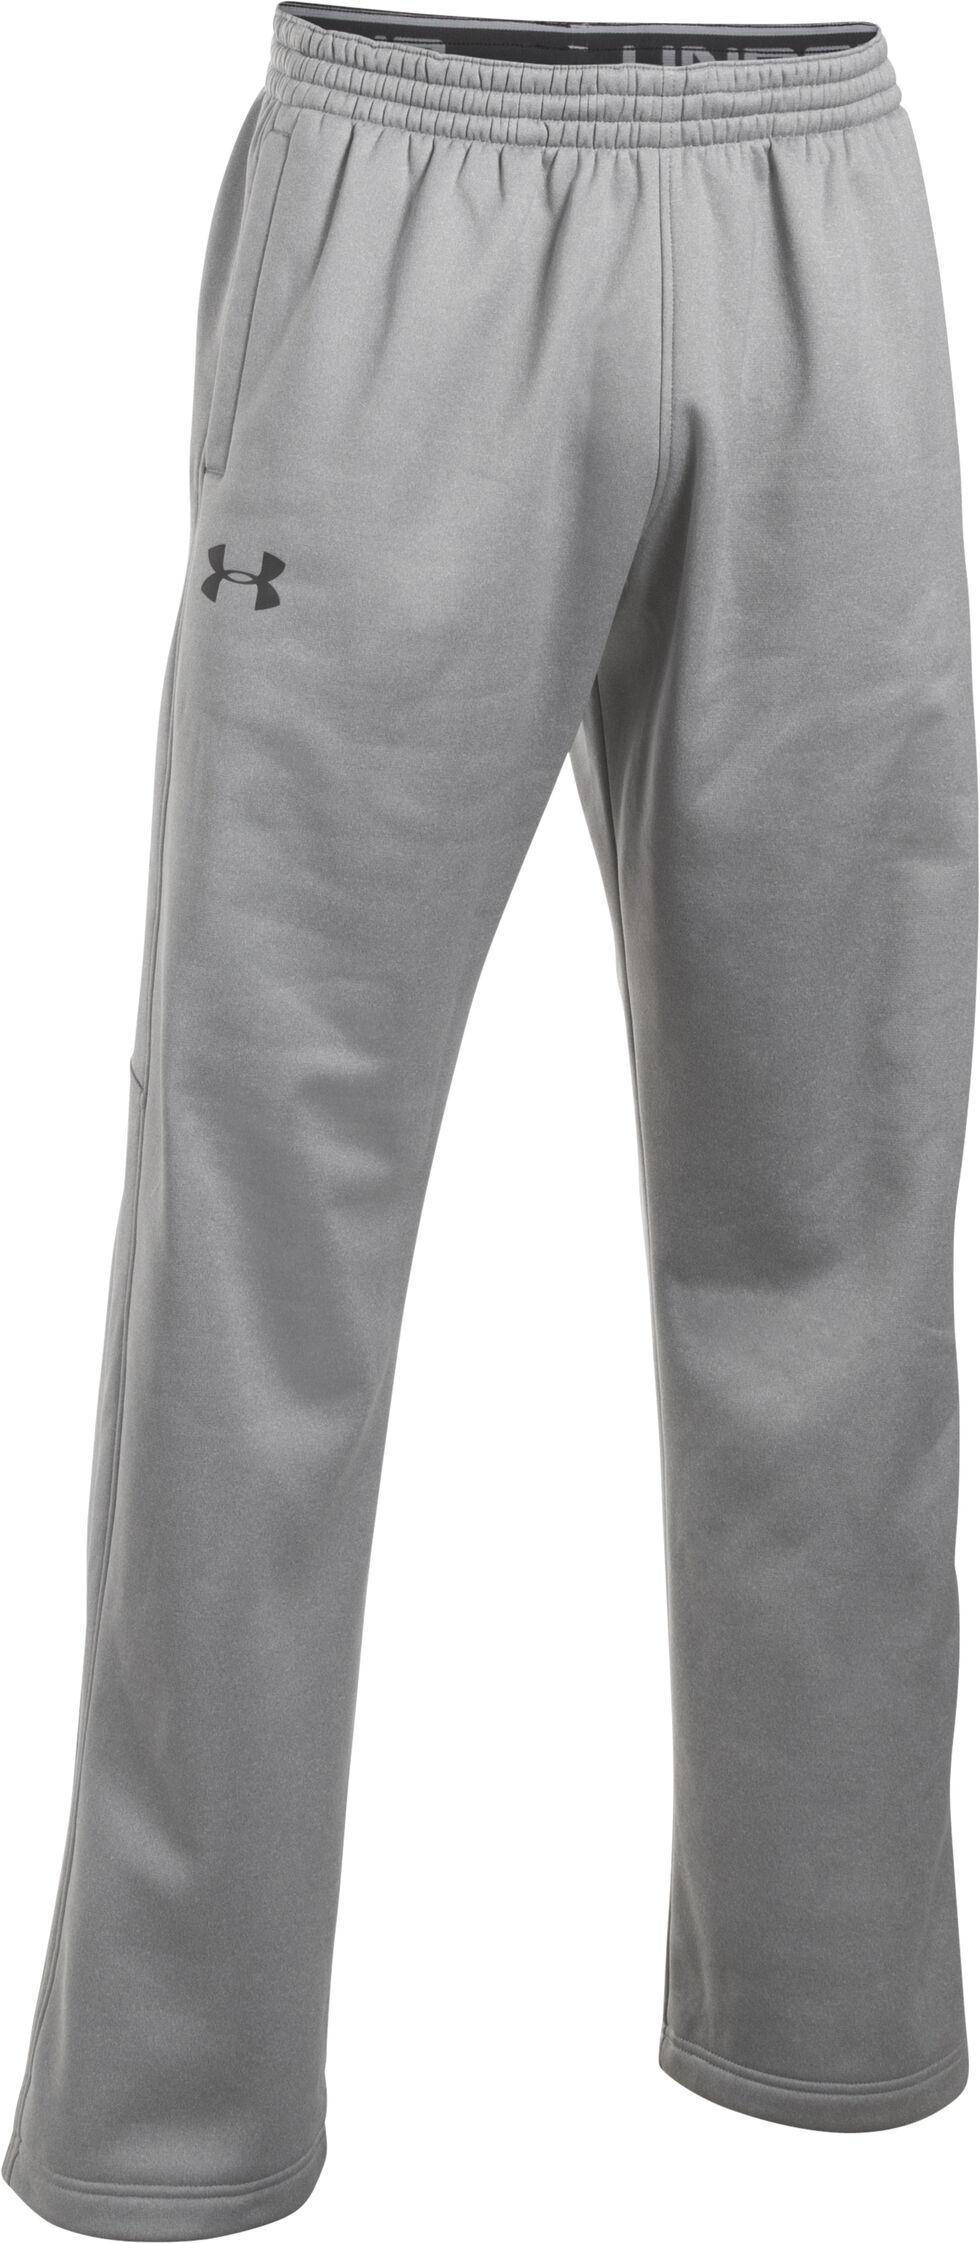 Under Armour Men's Grey Storm Armour® Fleece Pants, Grey, hi-res